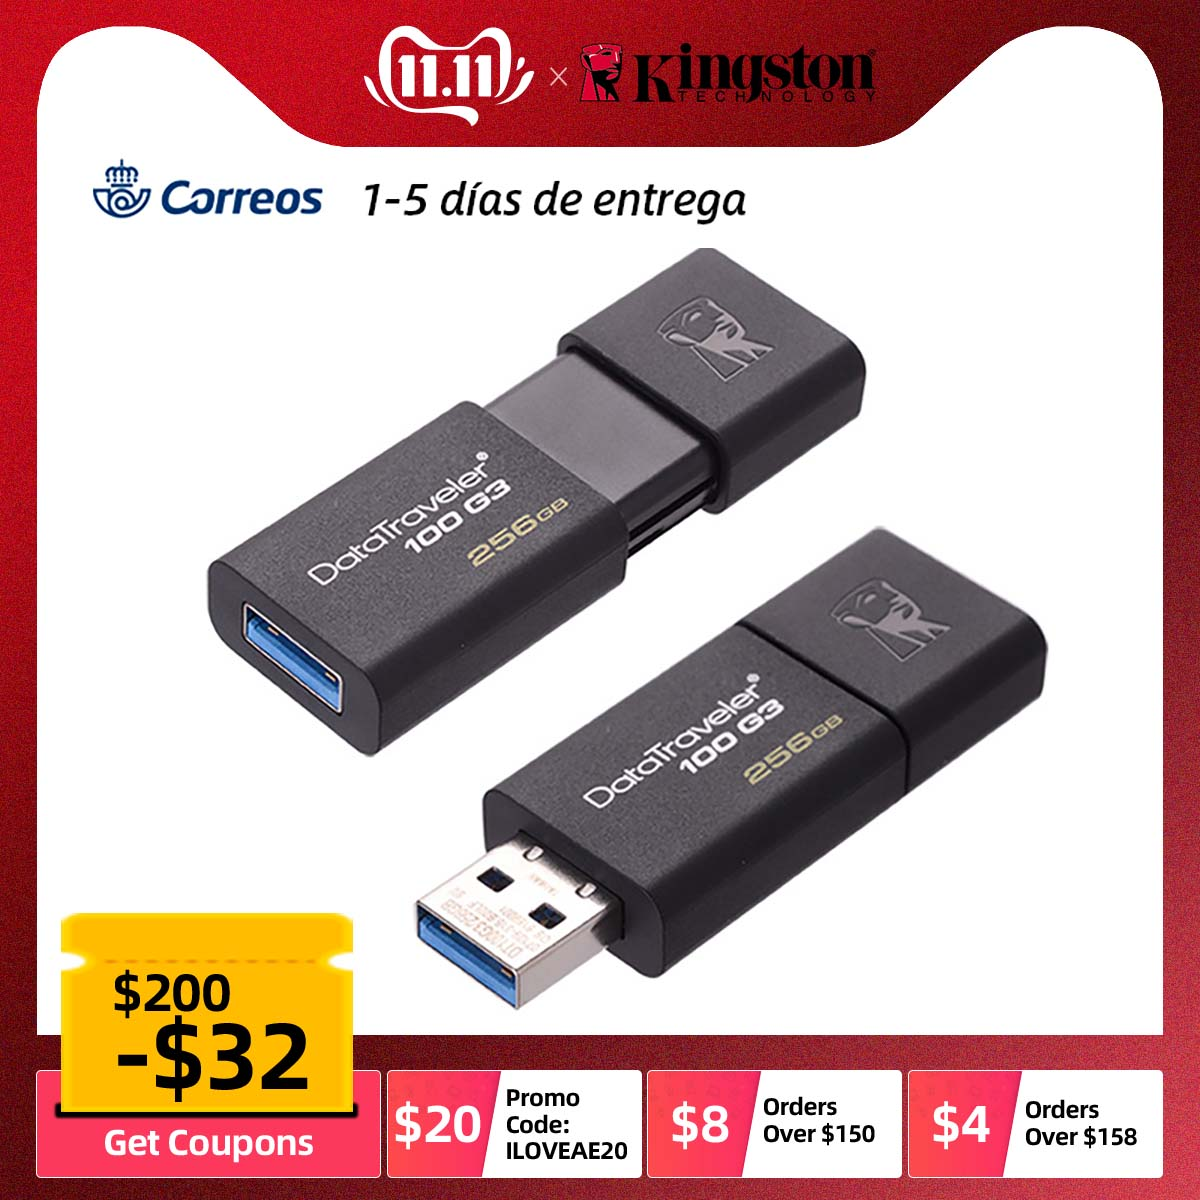 Clé USB haute vitesse USB 3.0 Kingston 32GB 64GB 128 GB 32 64 128 GB clé USB clé USB DT100G3